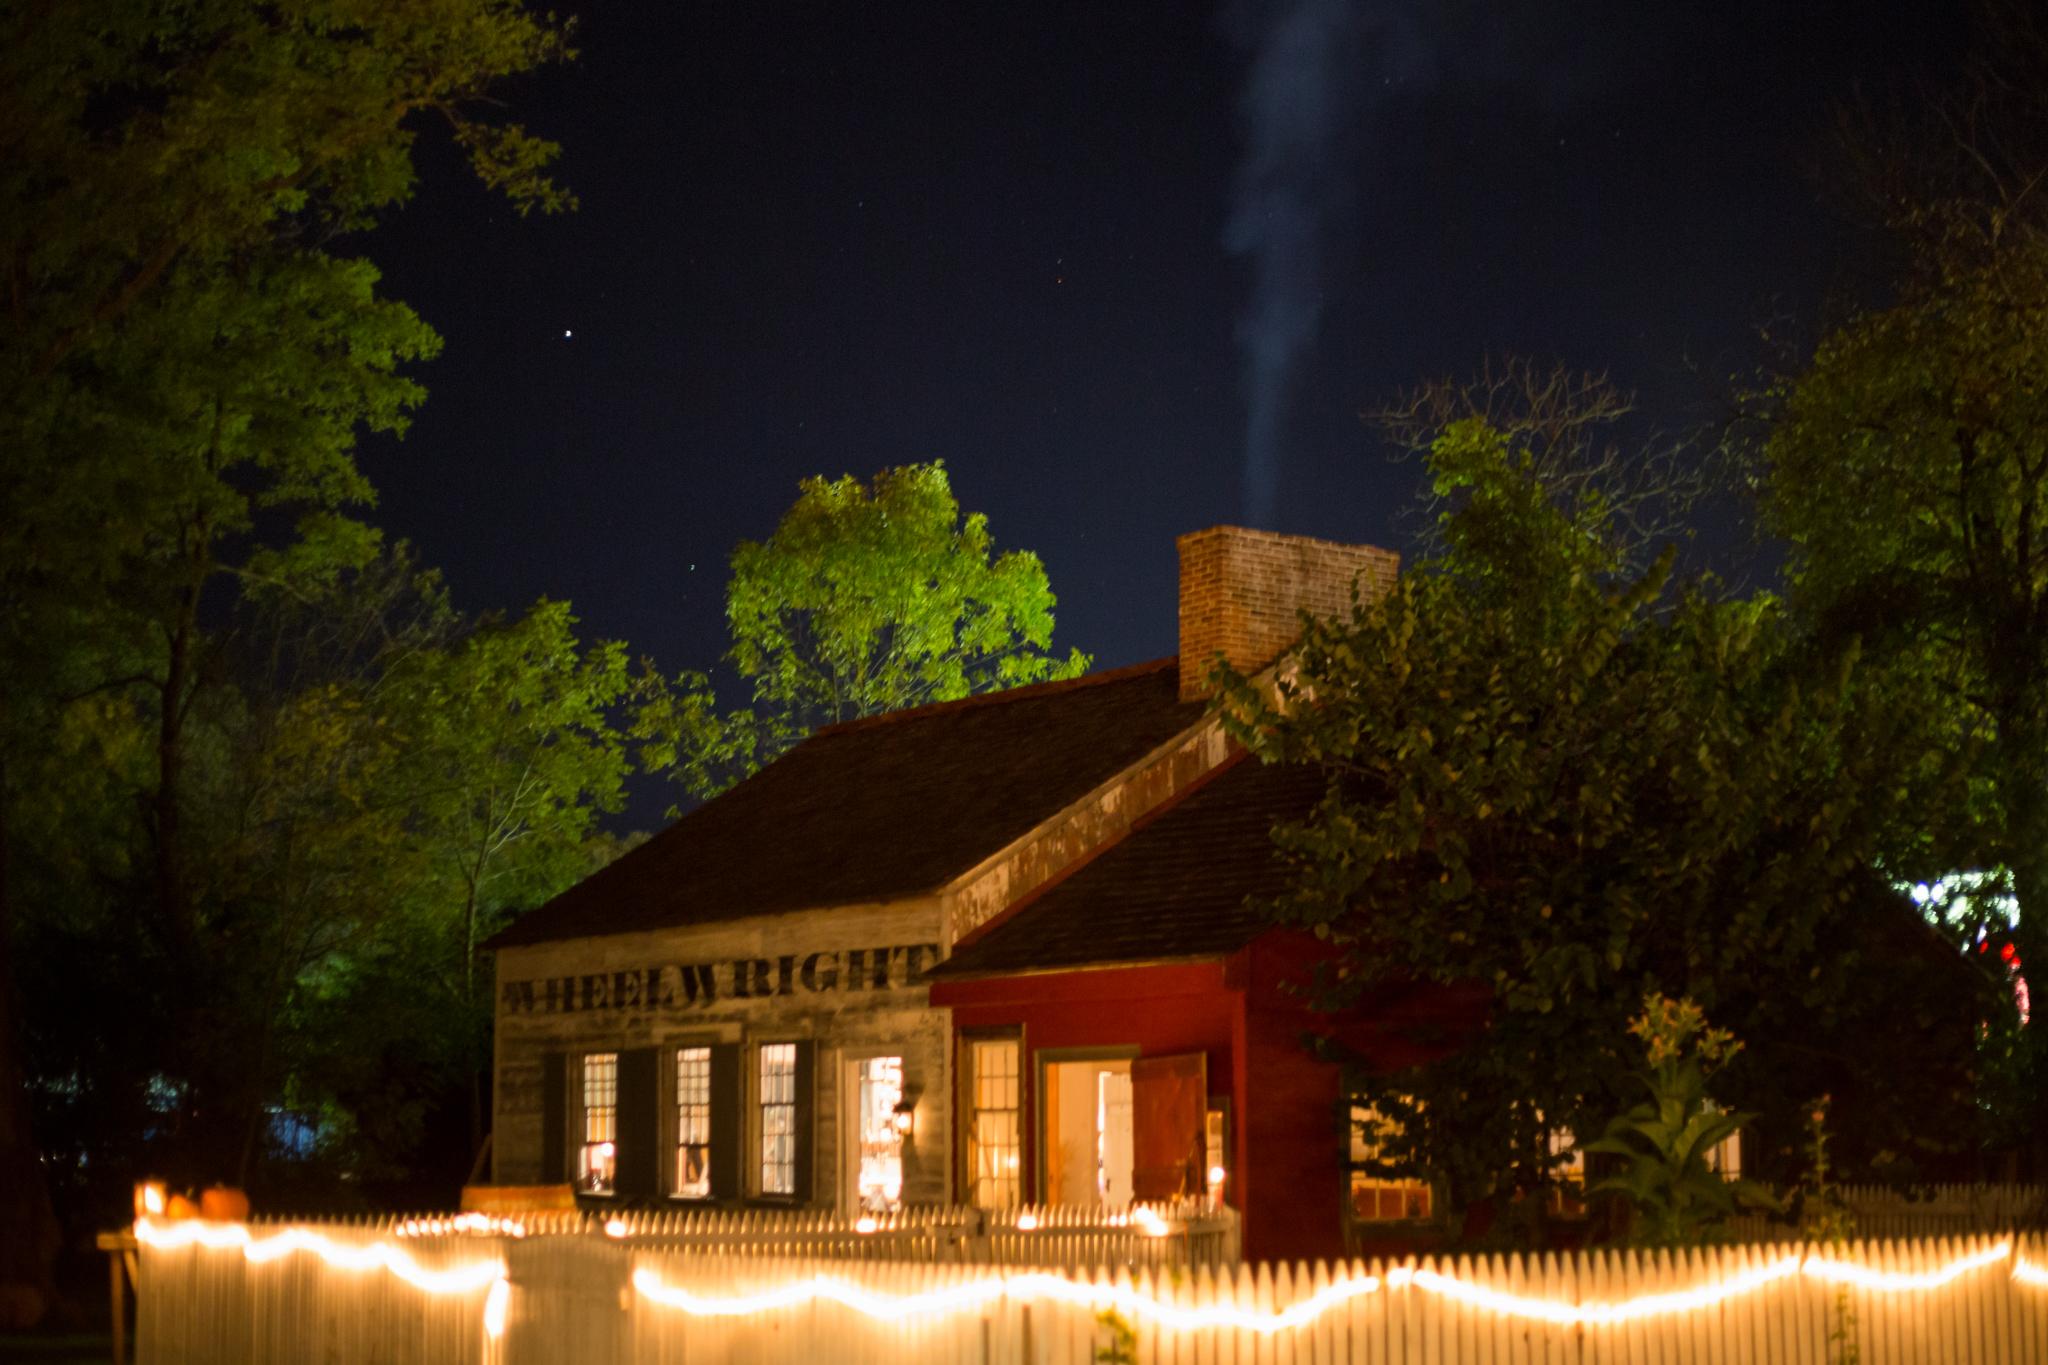 First Friday Dill's Tavern Julie Hagenbuch